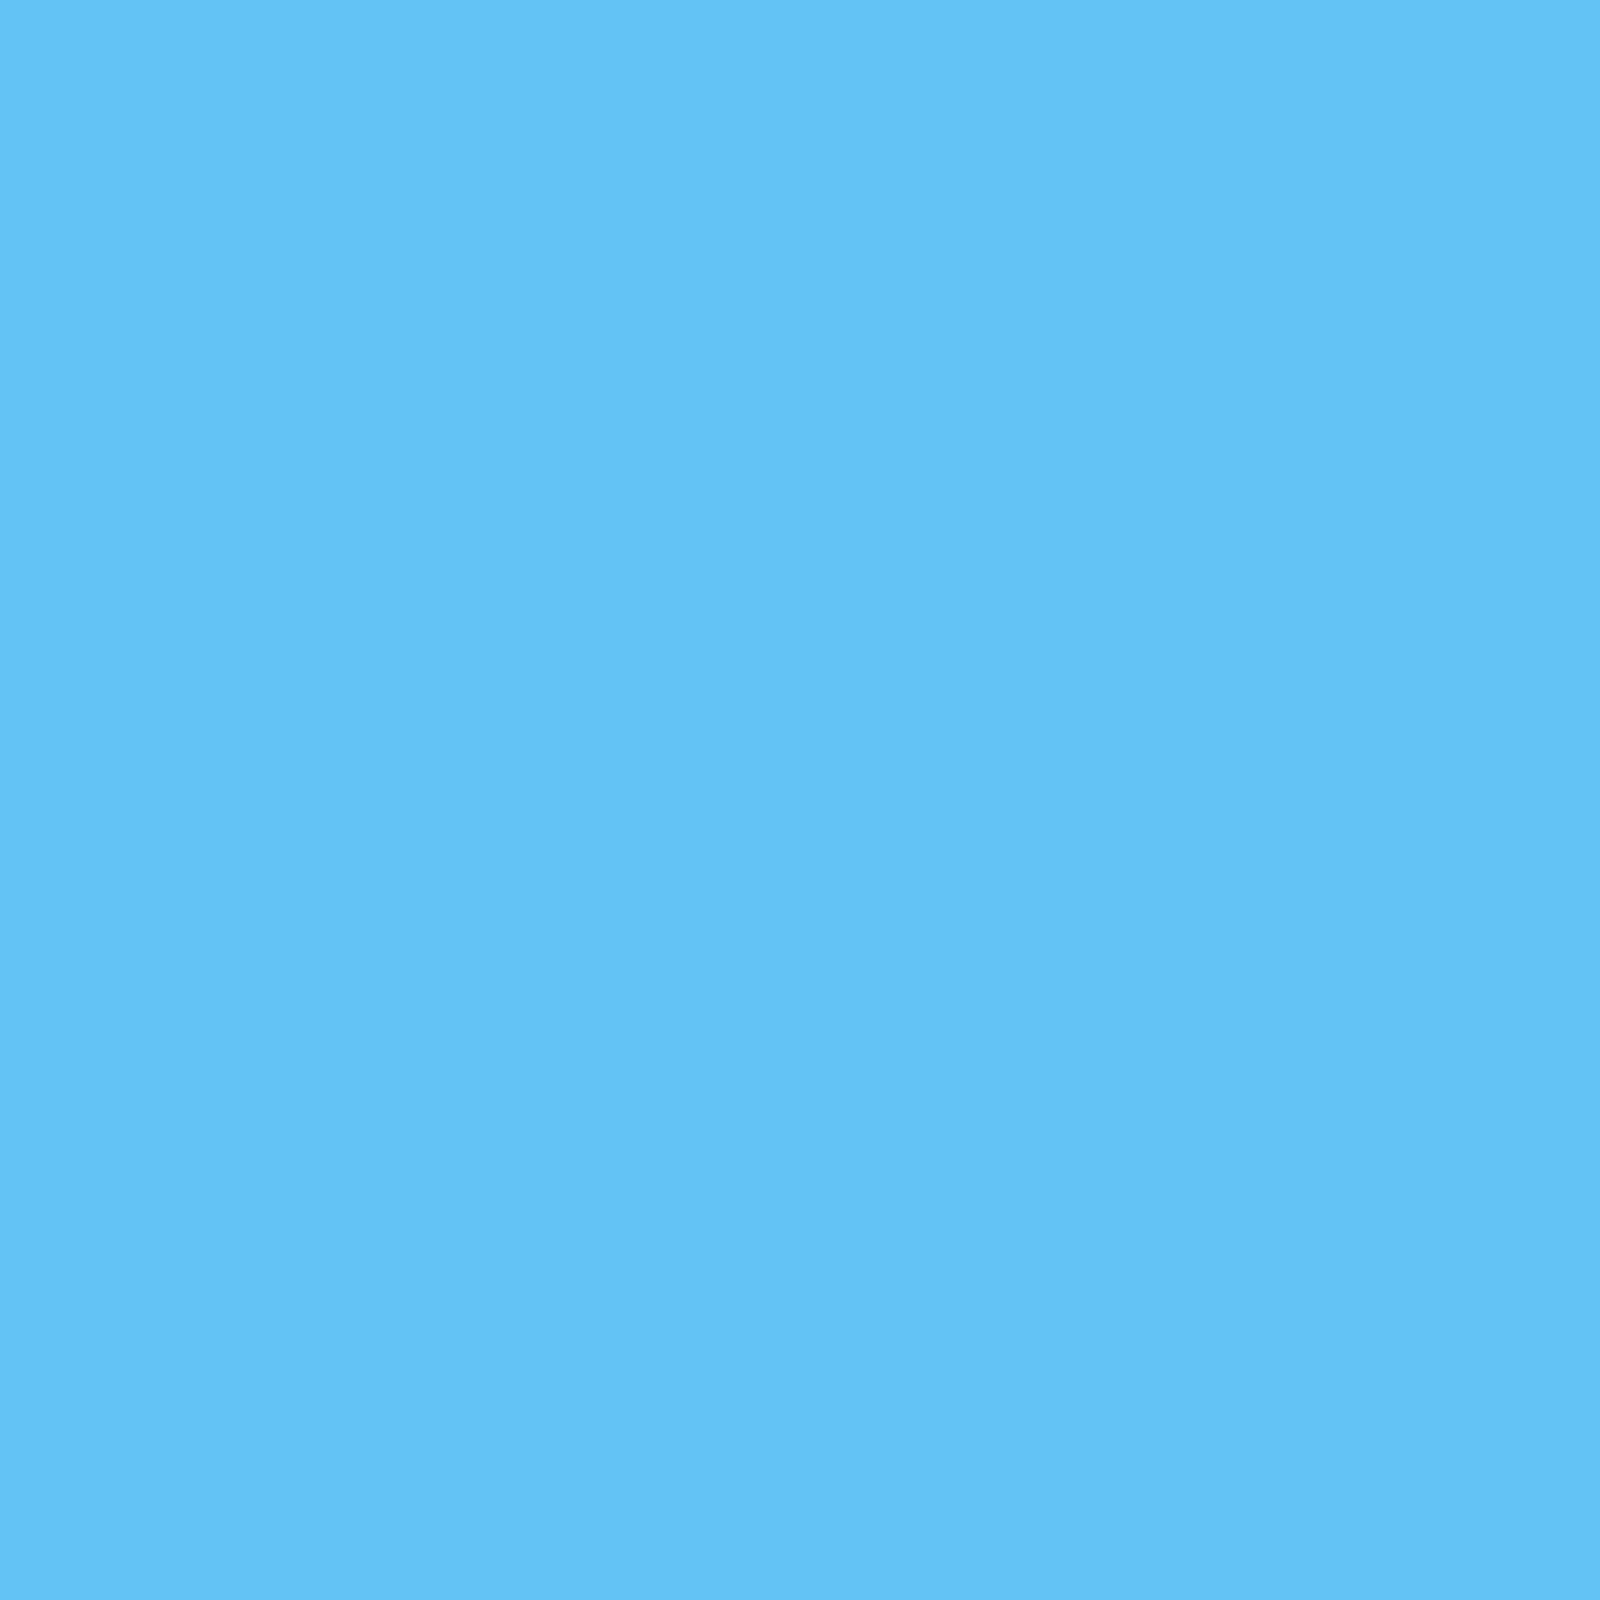 d-c fix Klebefolie AQUA- blau - Lack-Optik - 45x200 cm